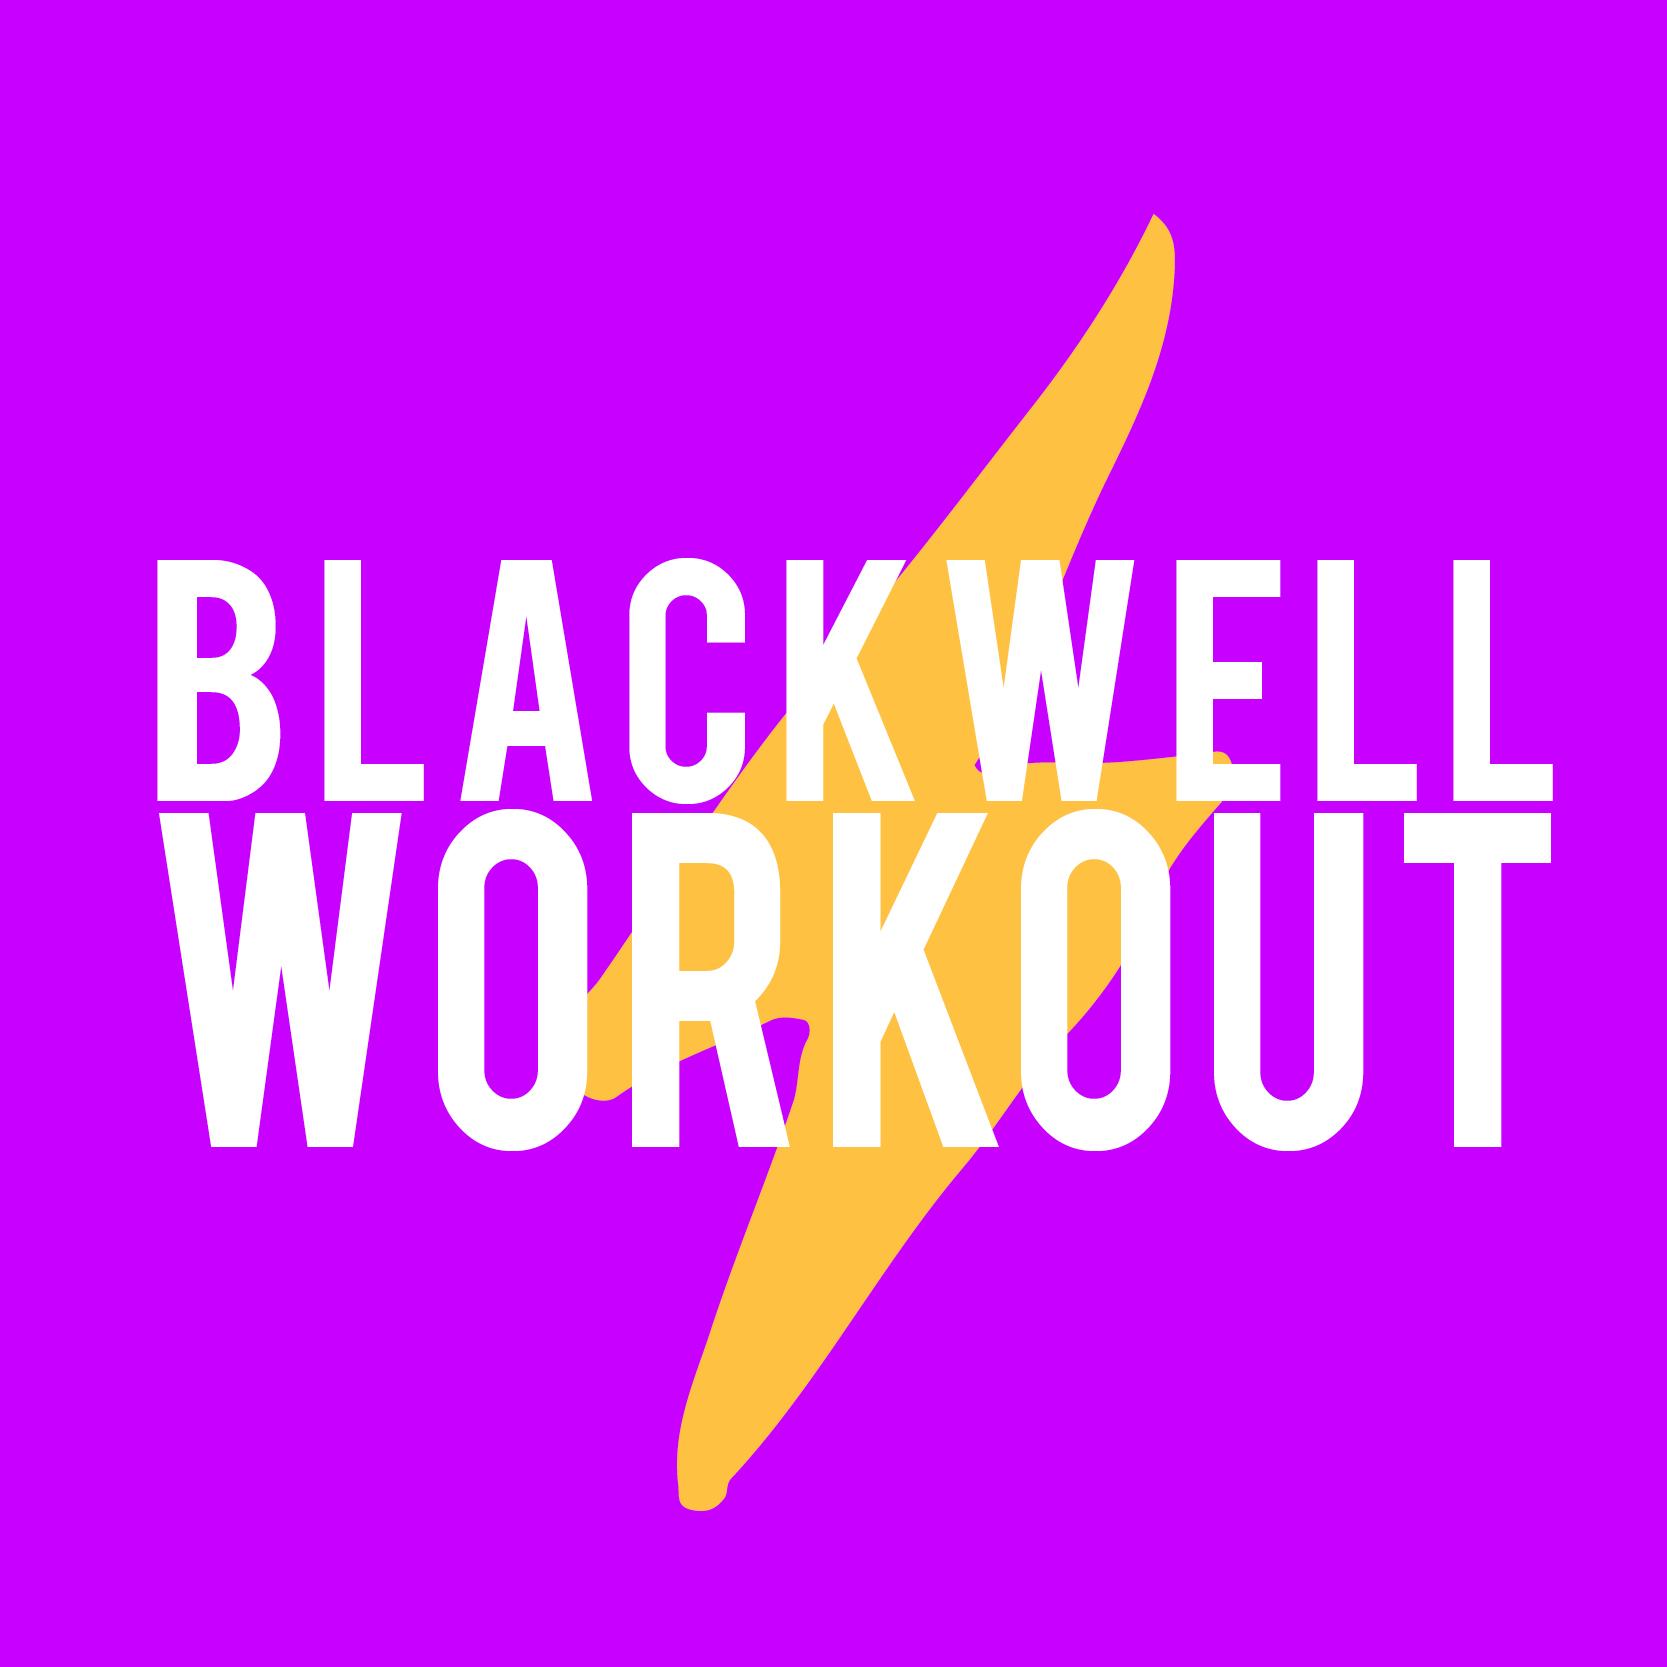 blackwell workout.jpg